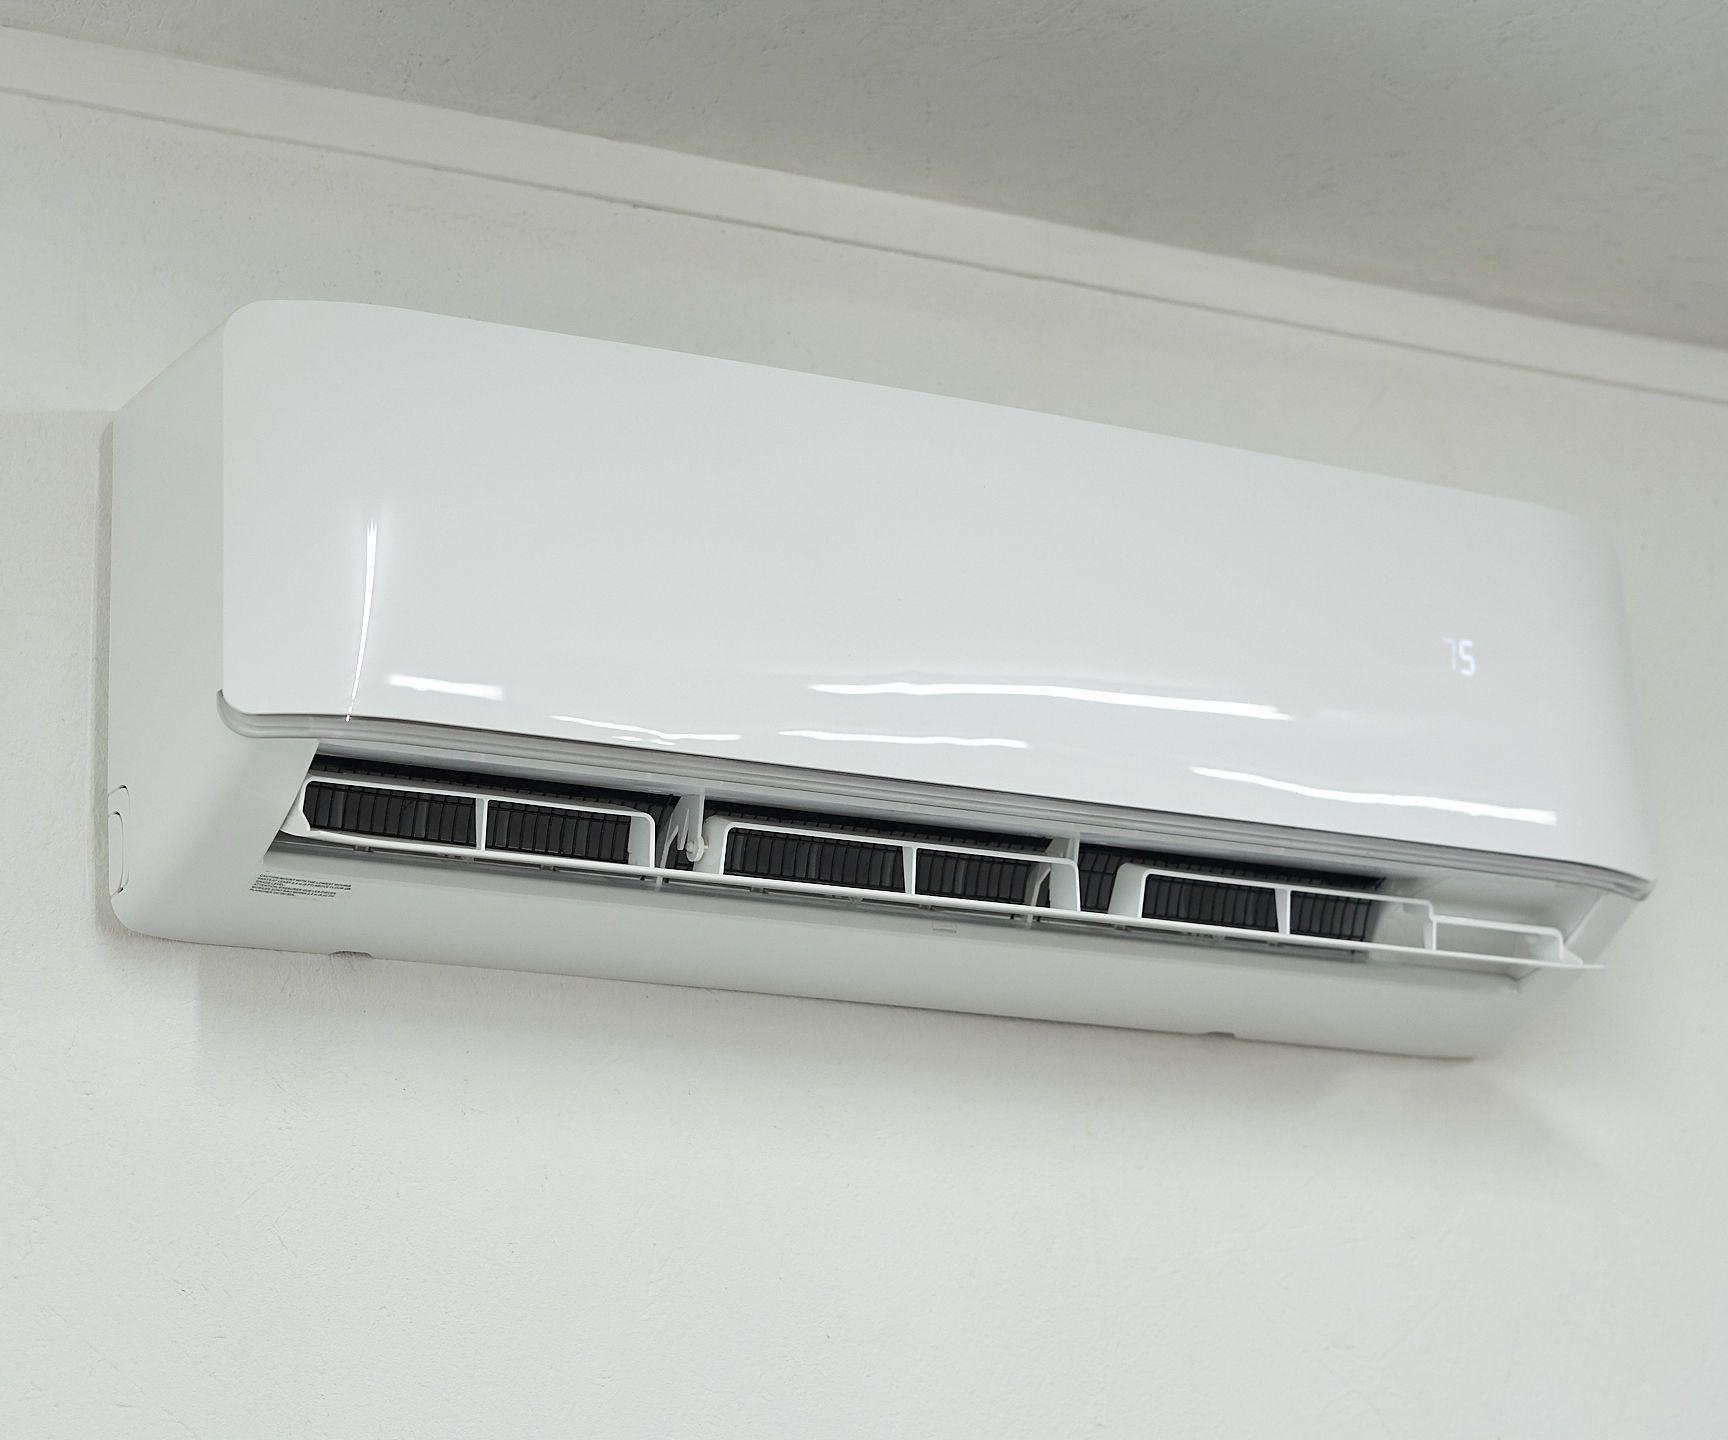 Install A Diy Mini Split Air Conditioner Heat Pump Air Conditioning Installation Air Conditioner Installation Diy Air Conditioner